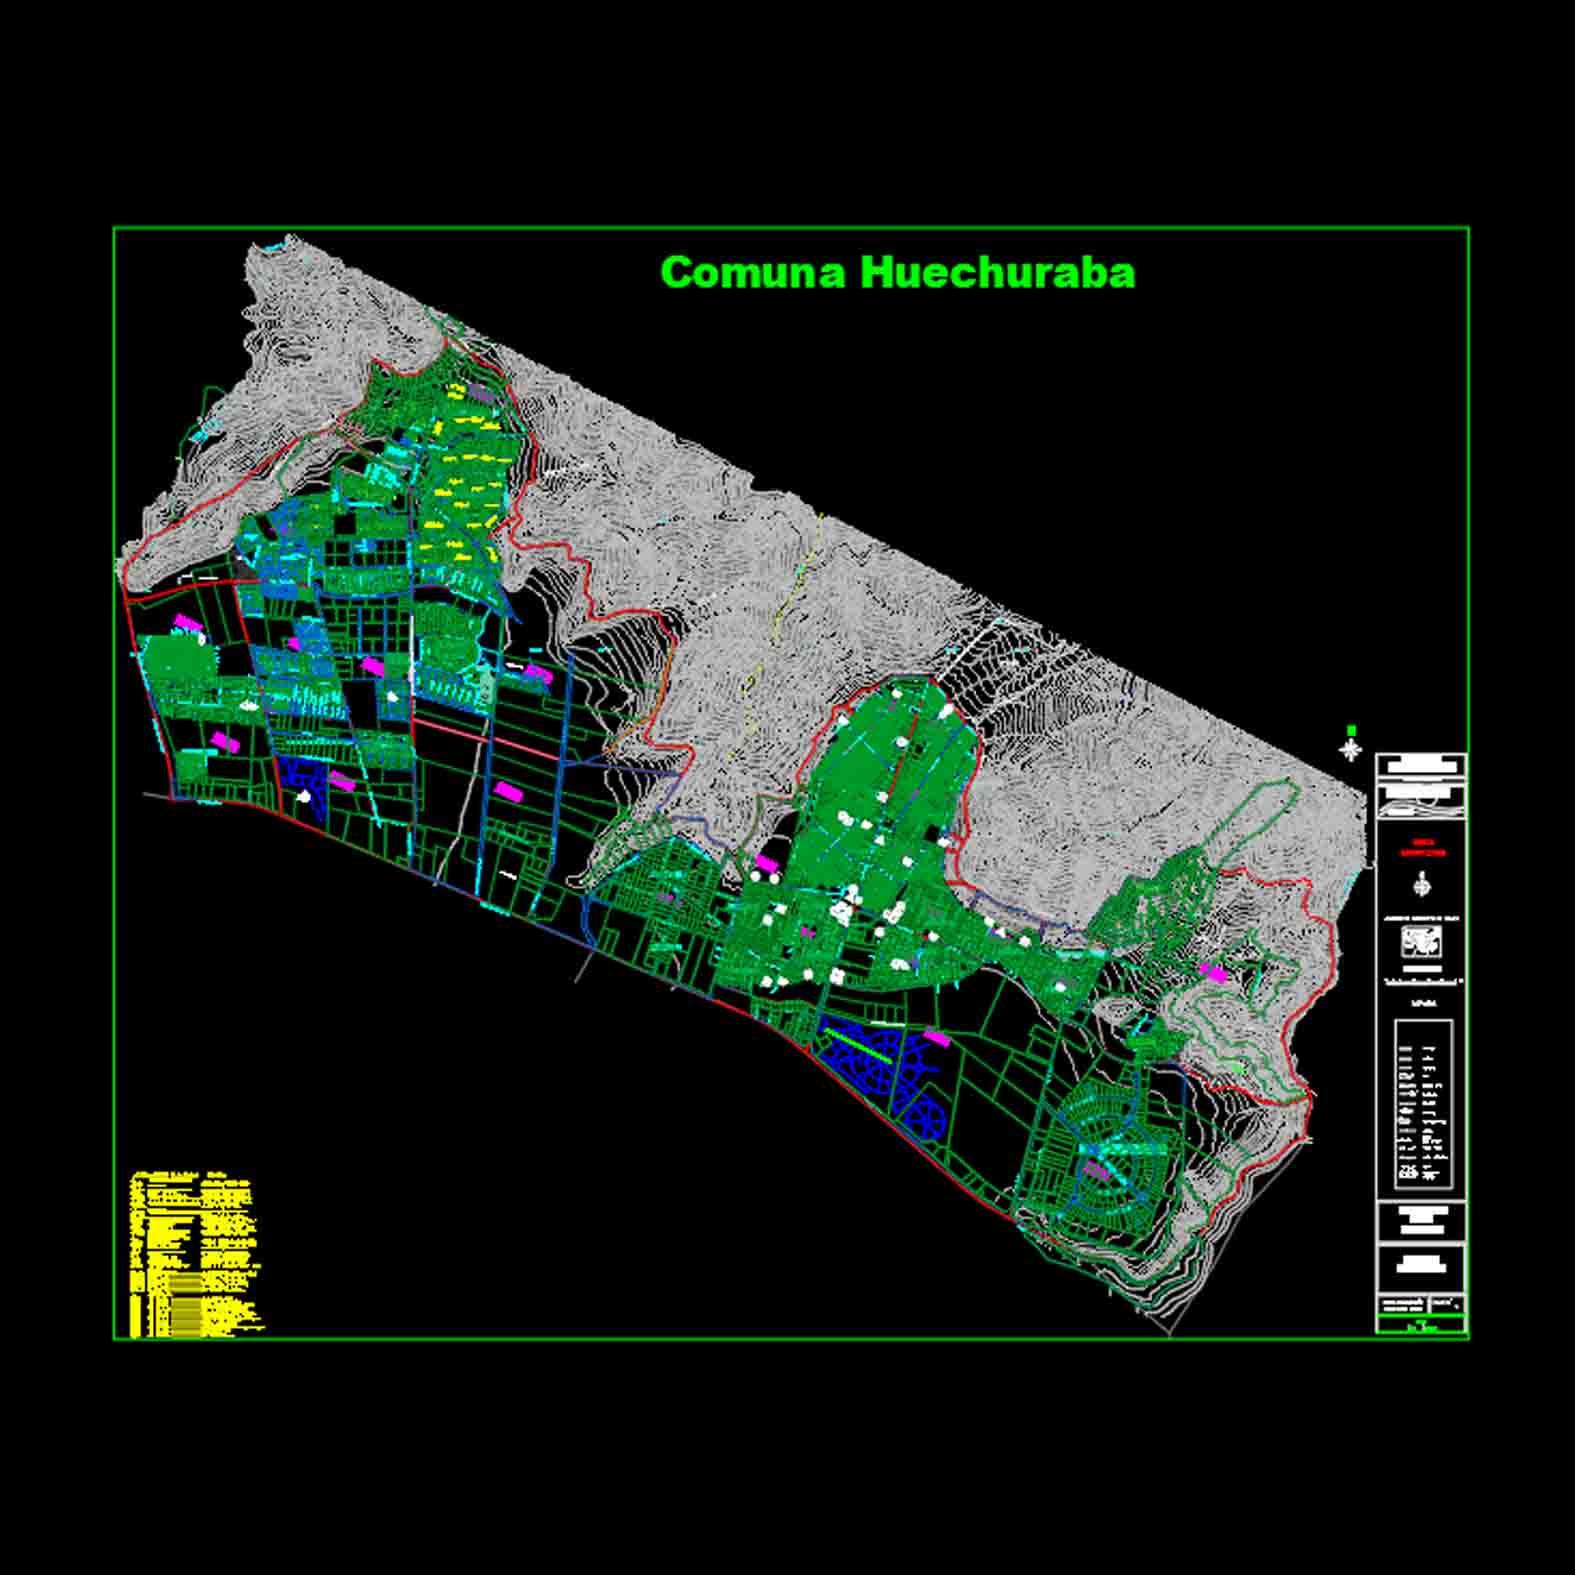 Plano: Comuna de Huechuraba